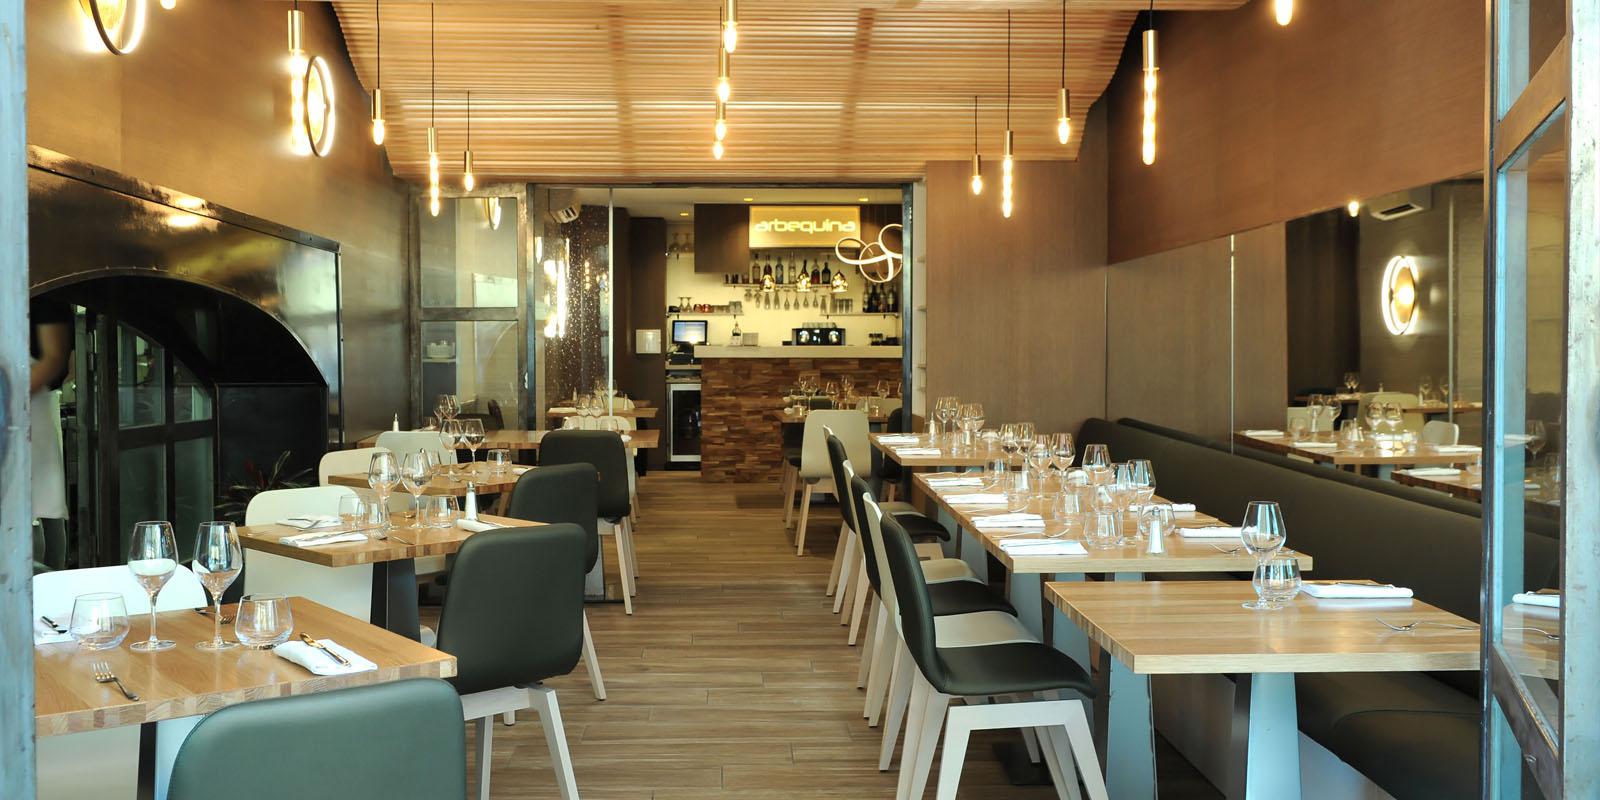 rencontre restaurant perpignan